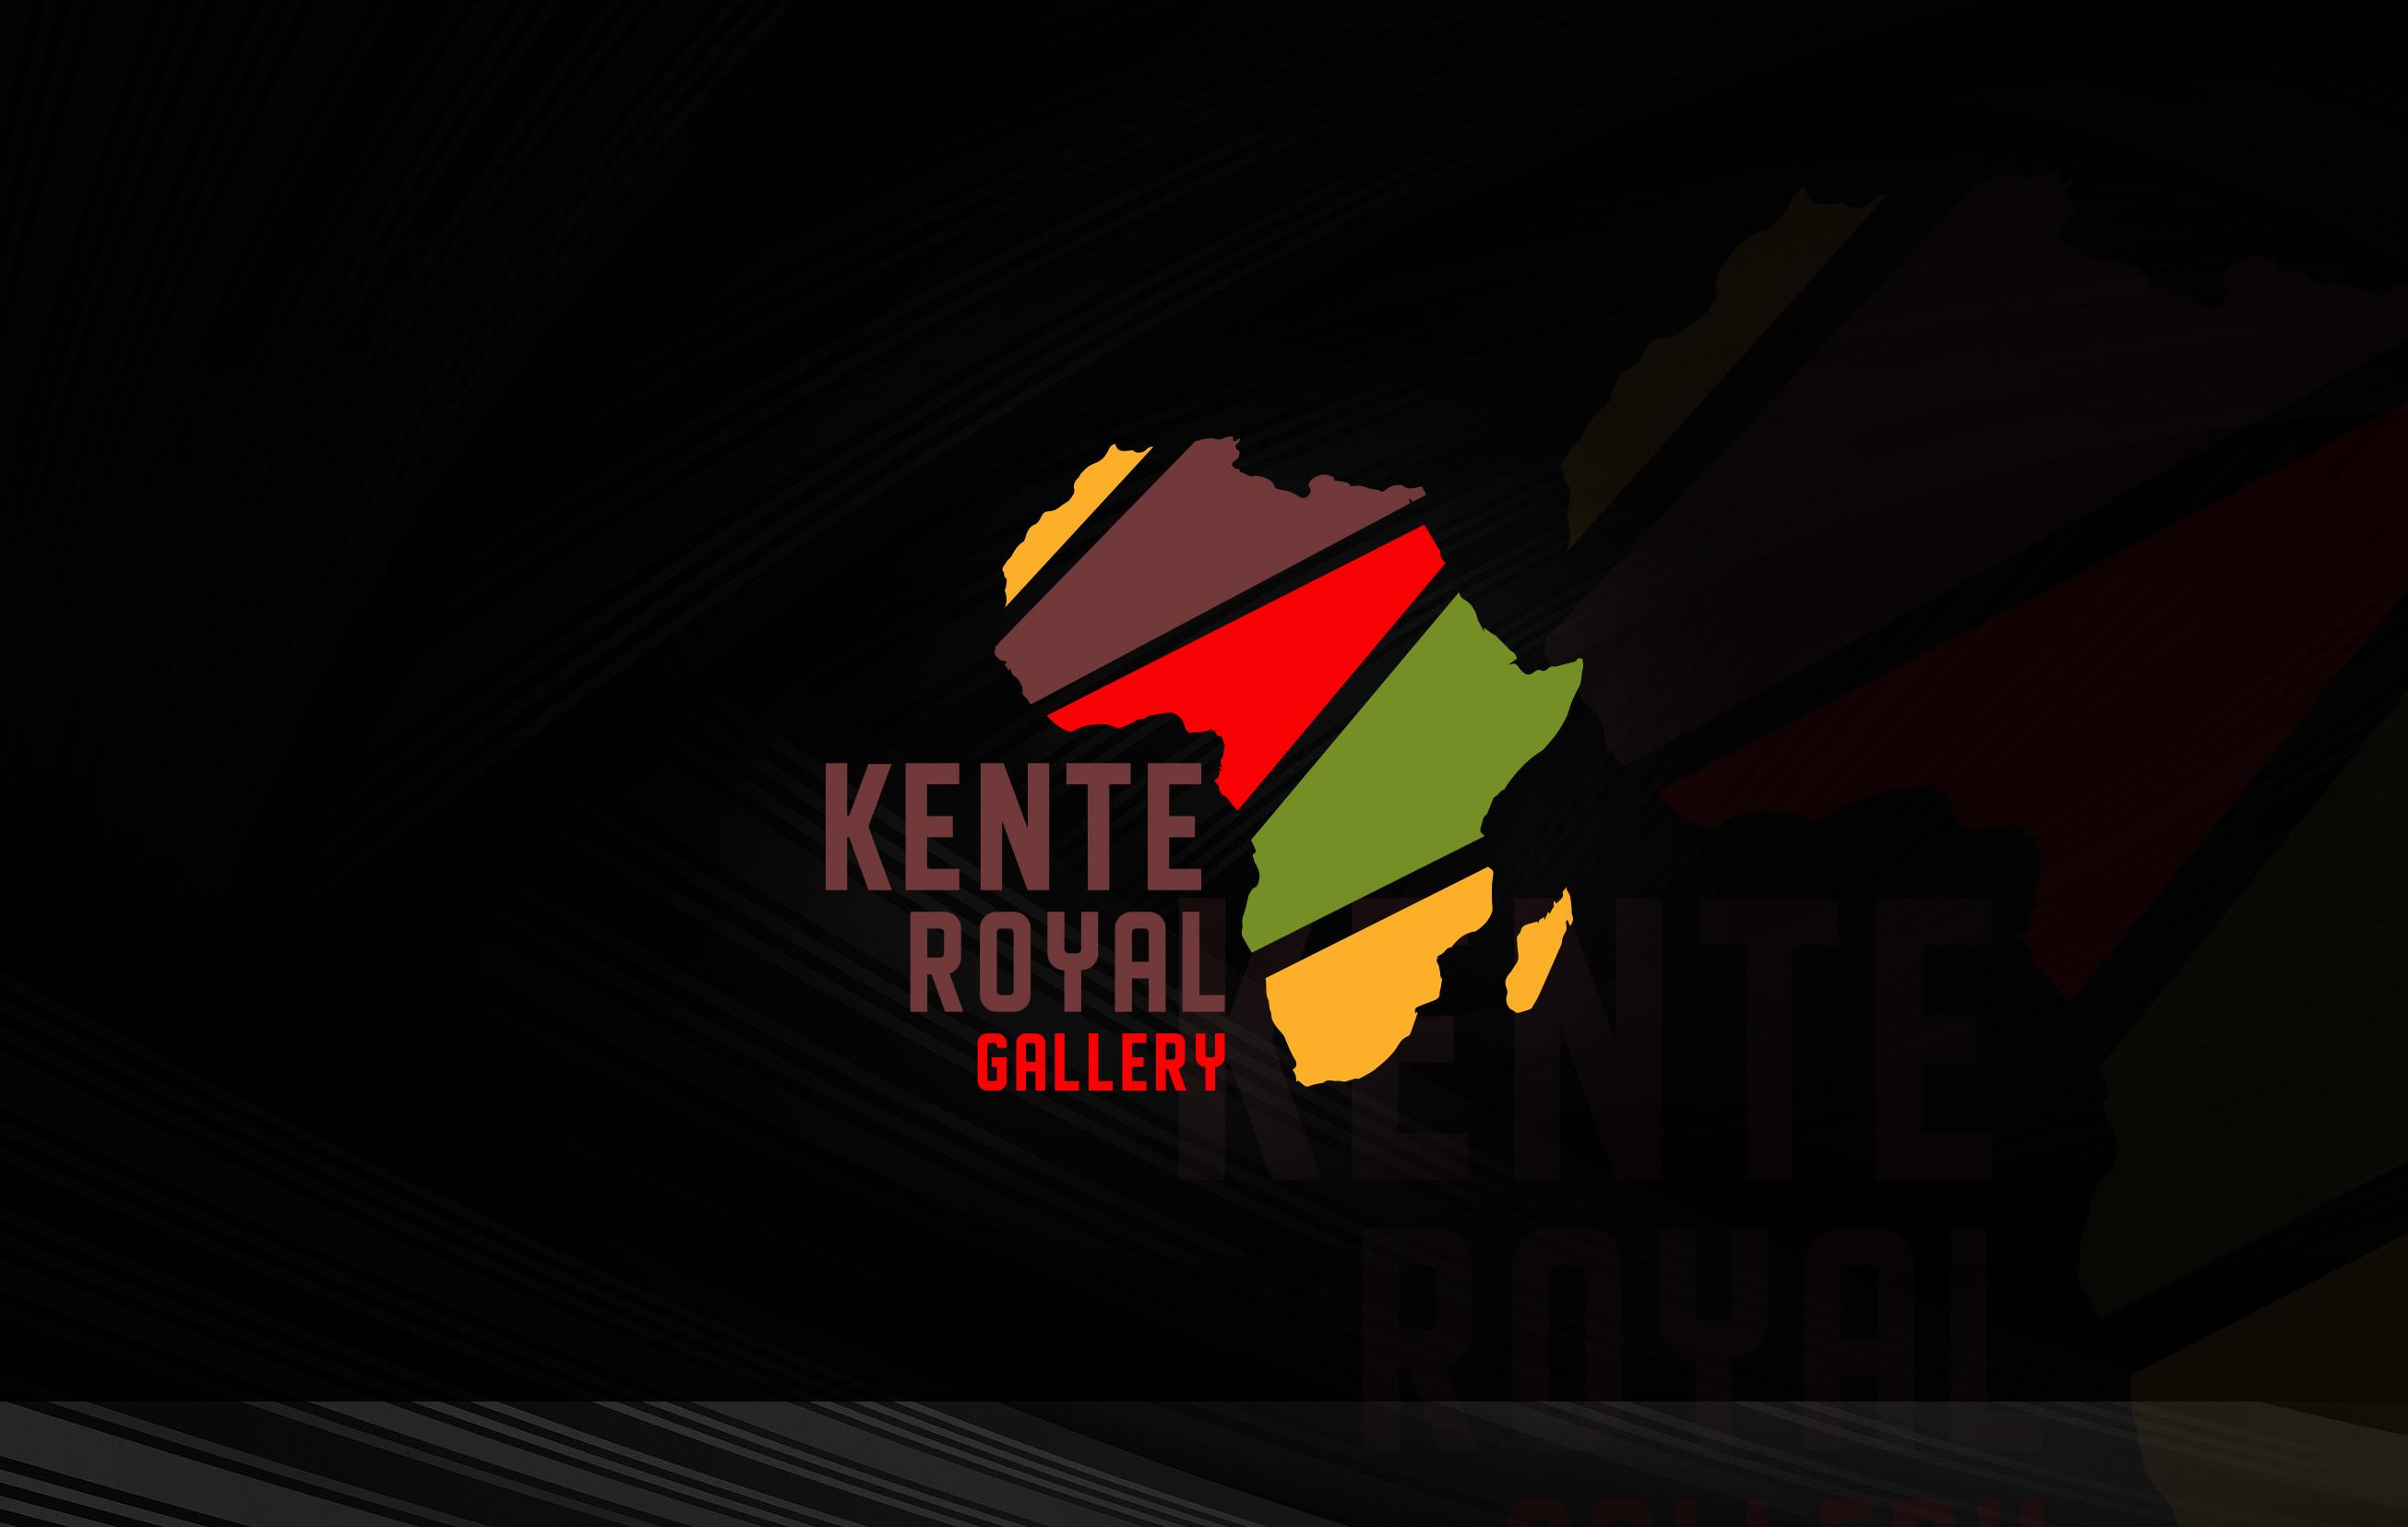 Kente Royal Gallery